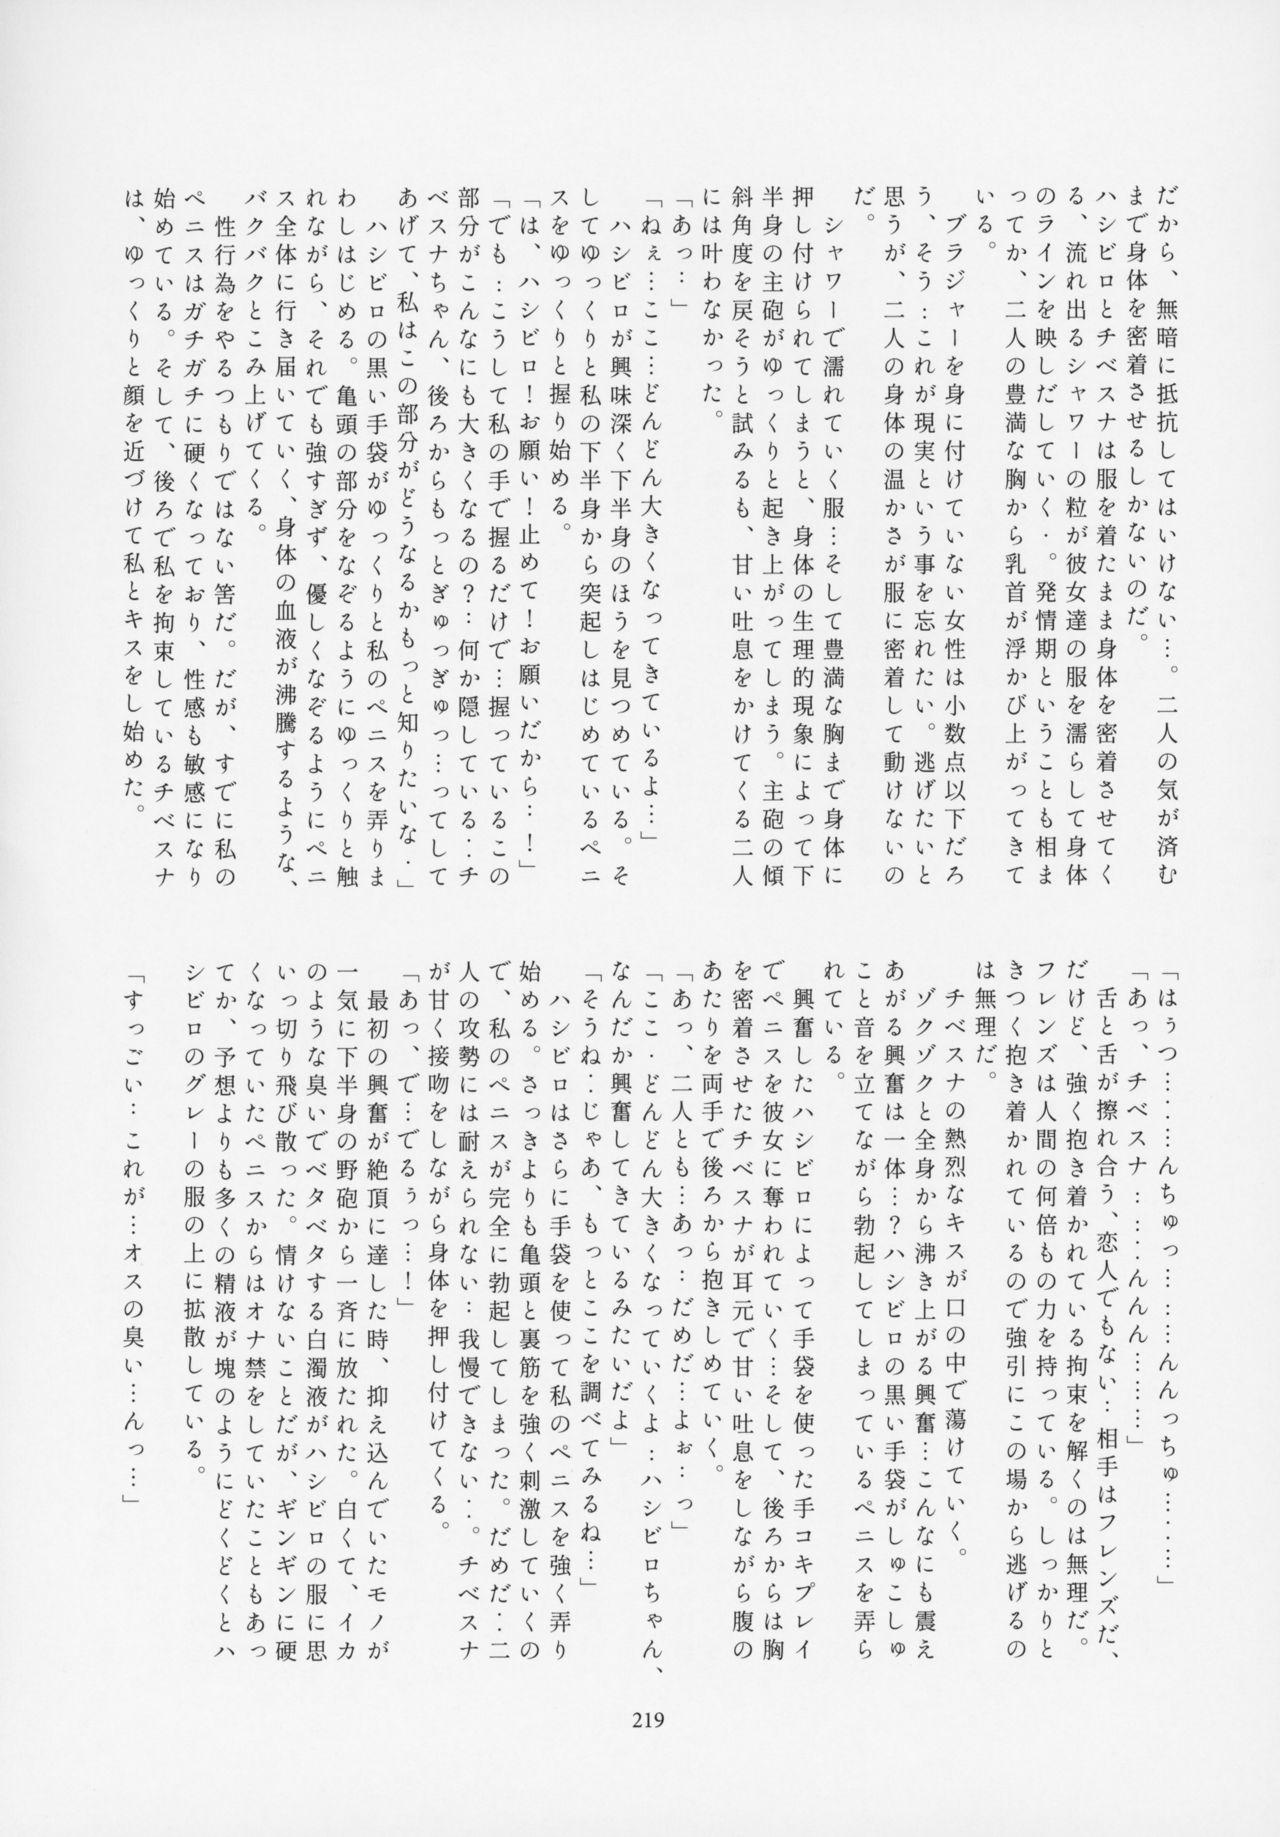 Friends Gyaku Rape Goudoushi 217